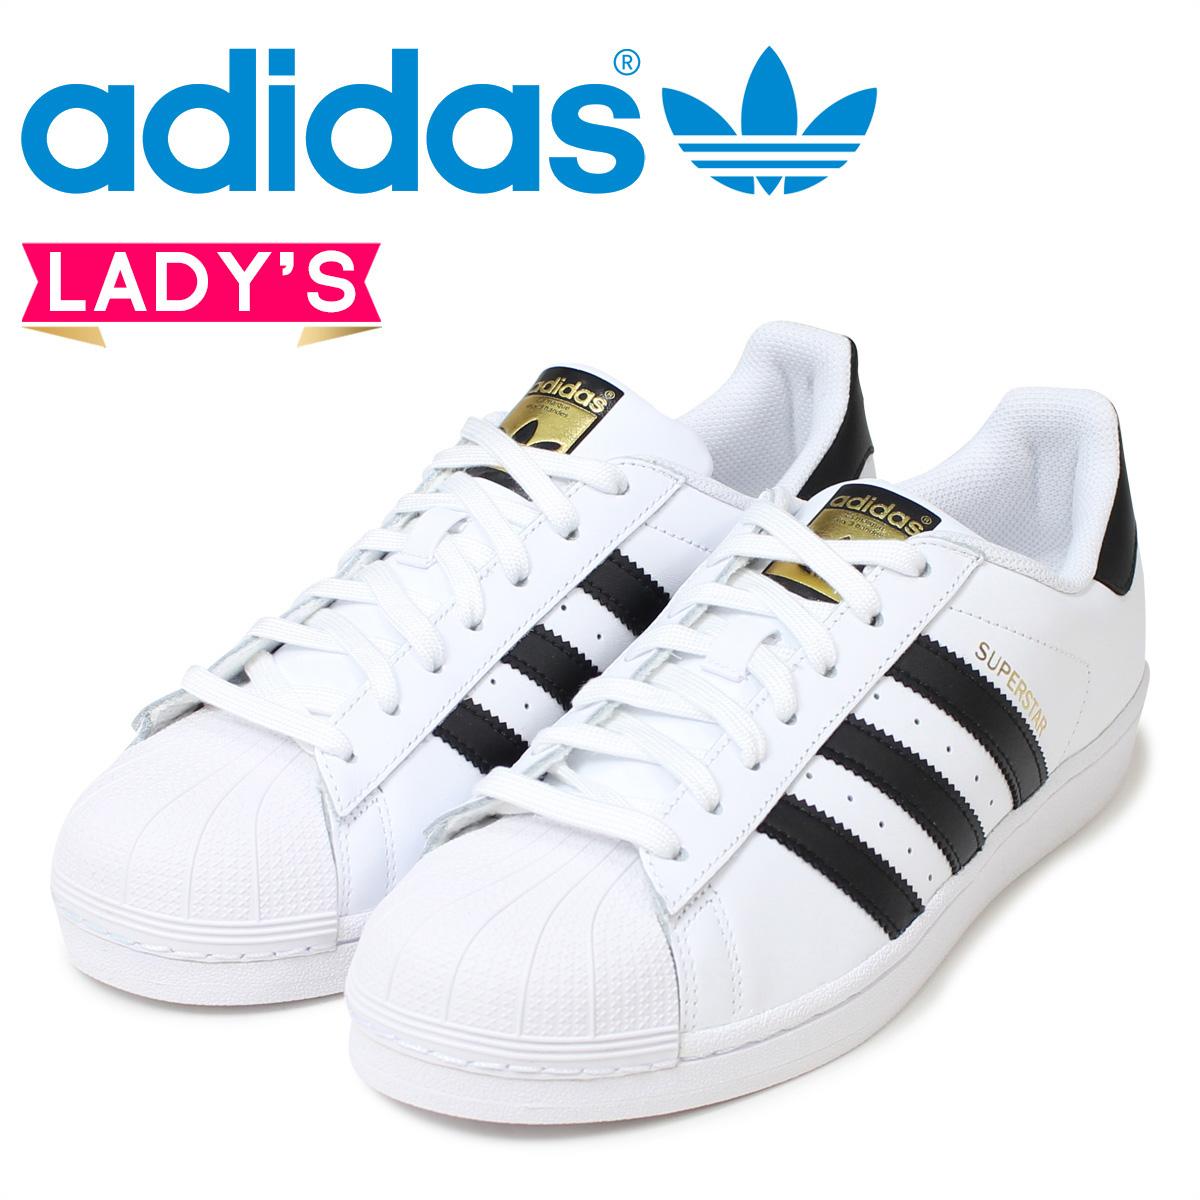 adidas classic superstar womens